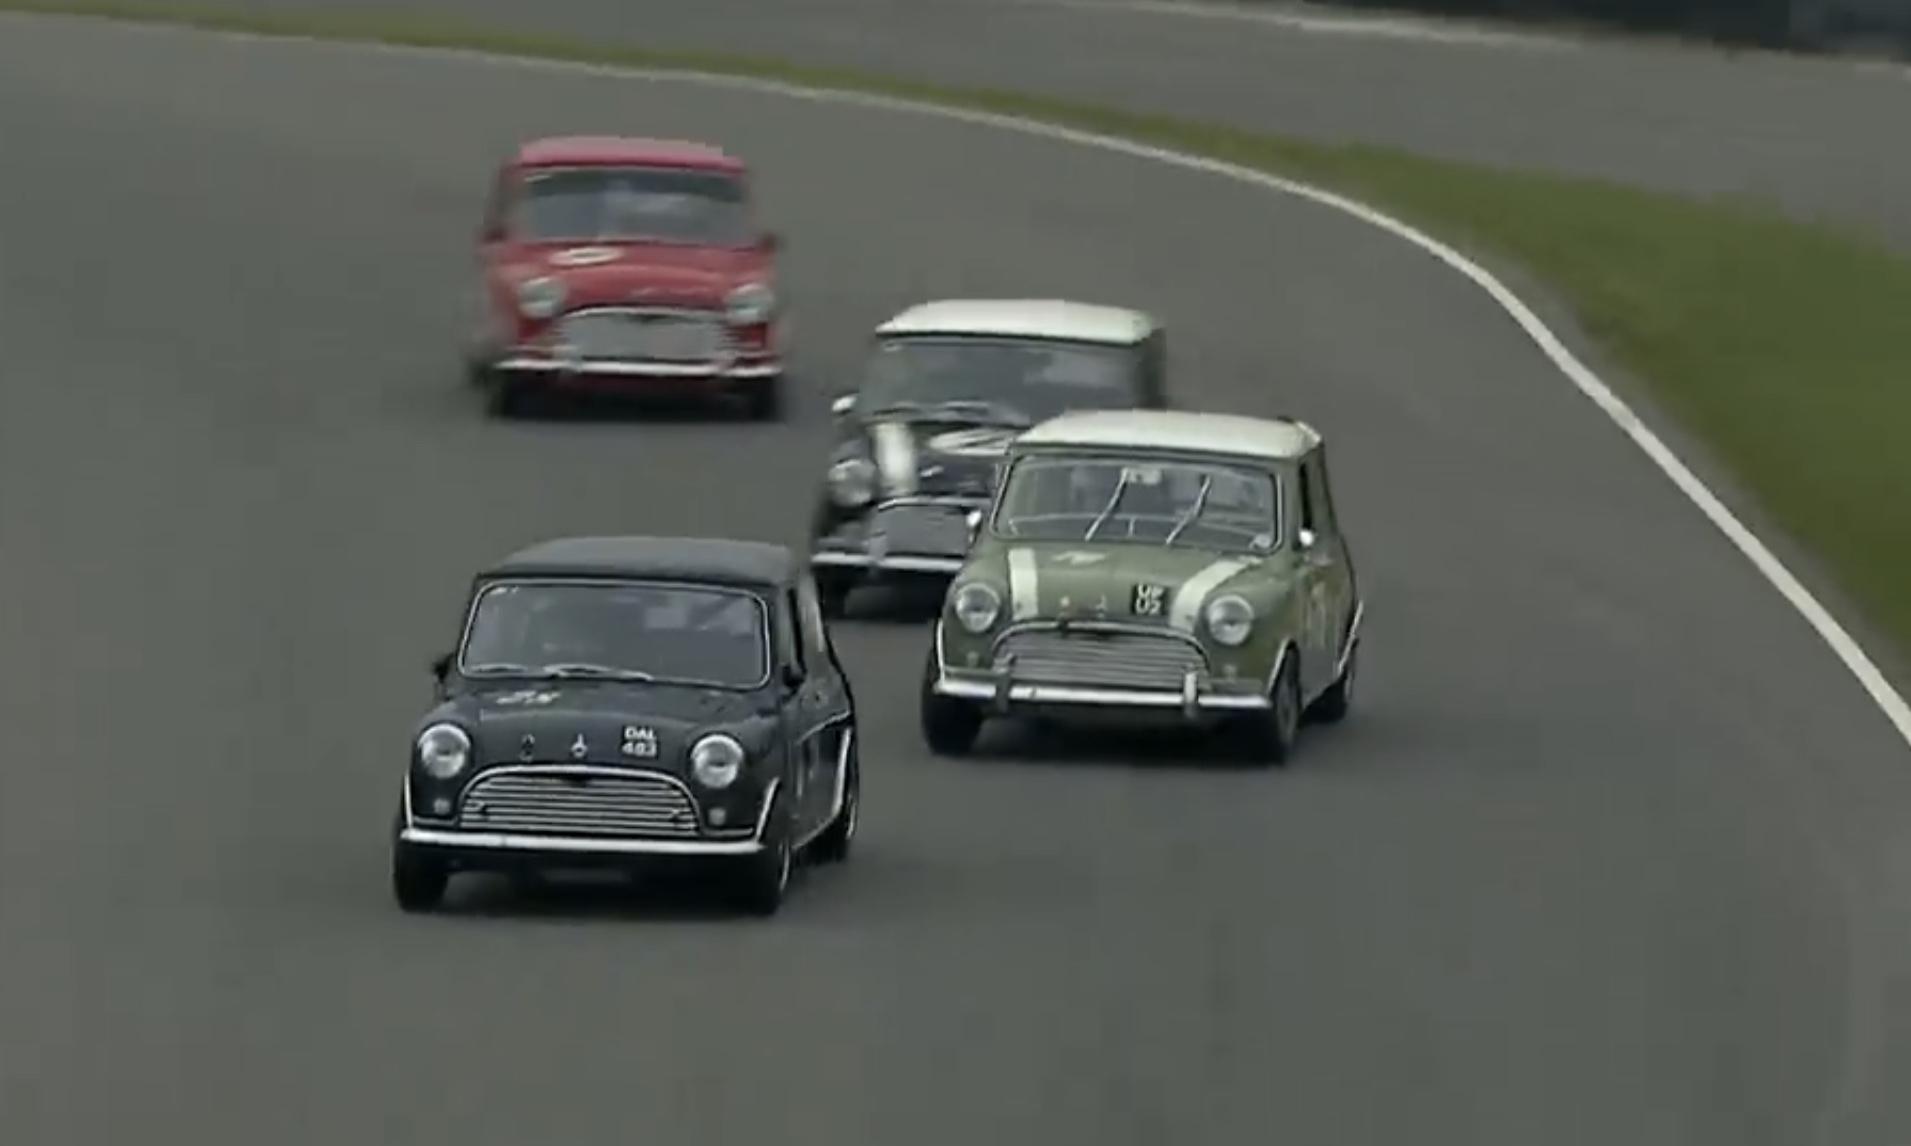 Race a Classic mini